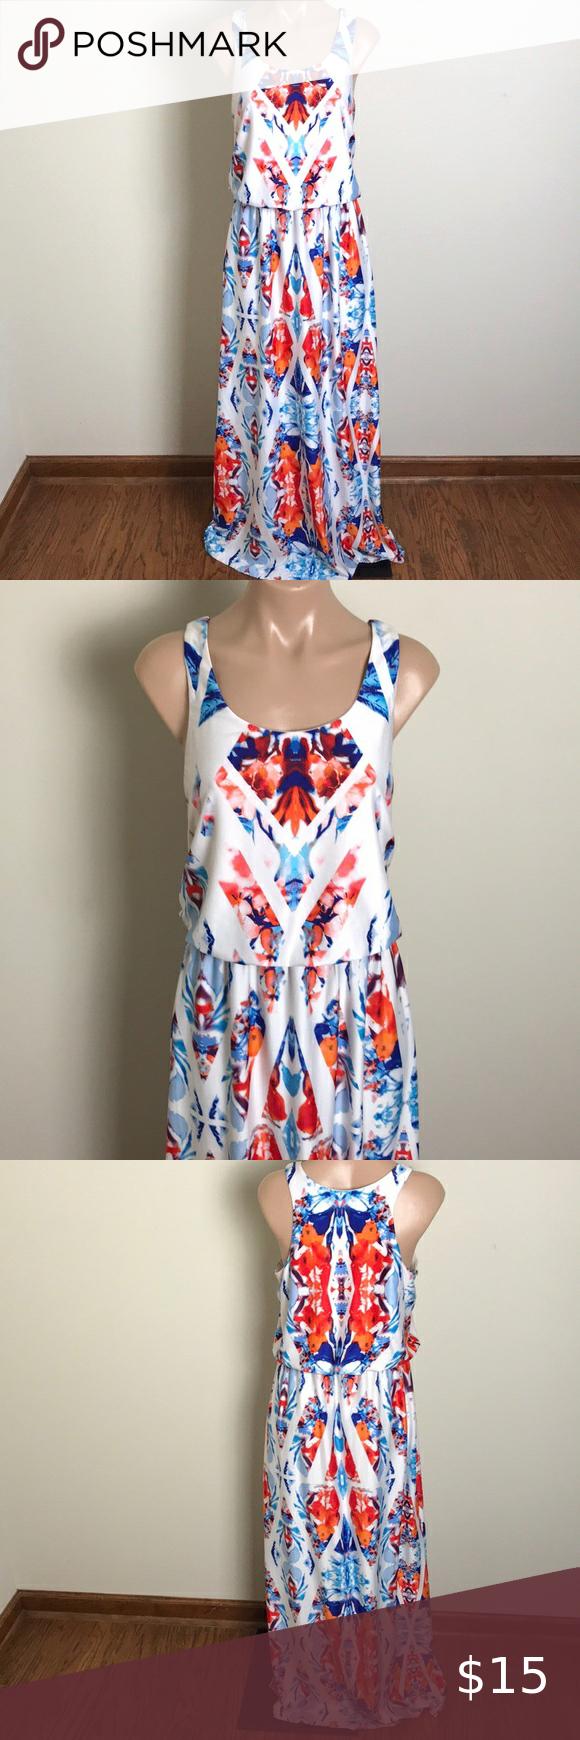 Cato Watercolor Maxi Dress Tank Top Blue Orange Tank Dress Top Maxi Dresses Dresses [ 1740 x 580 Pixel ]